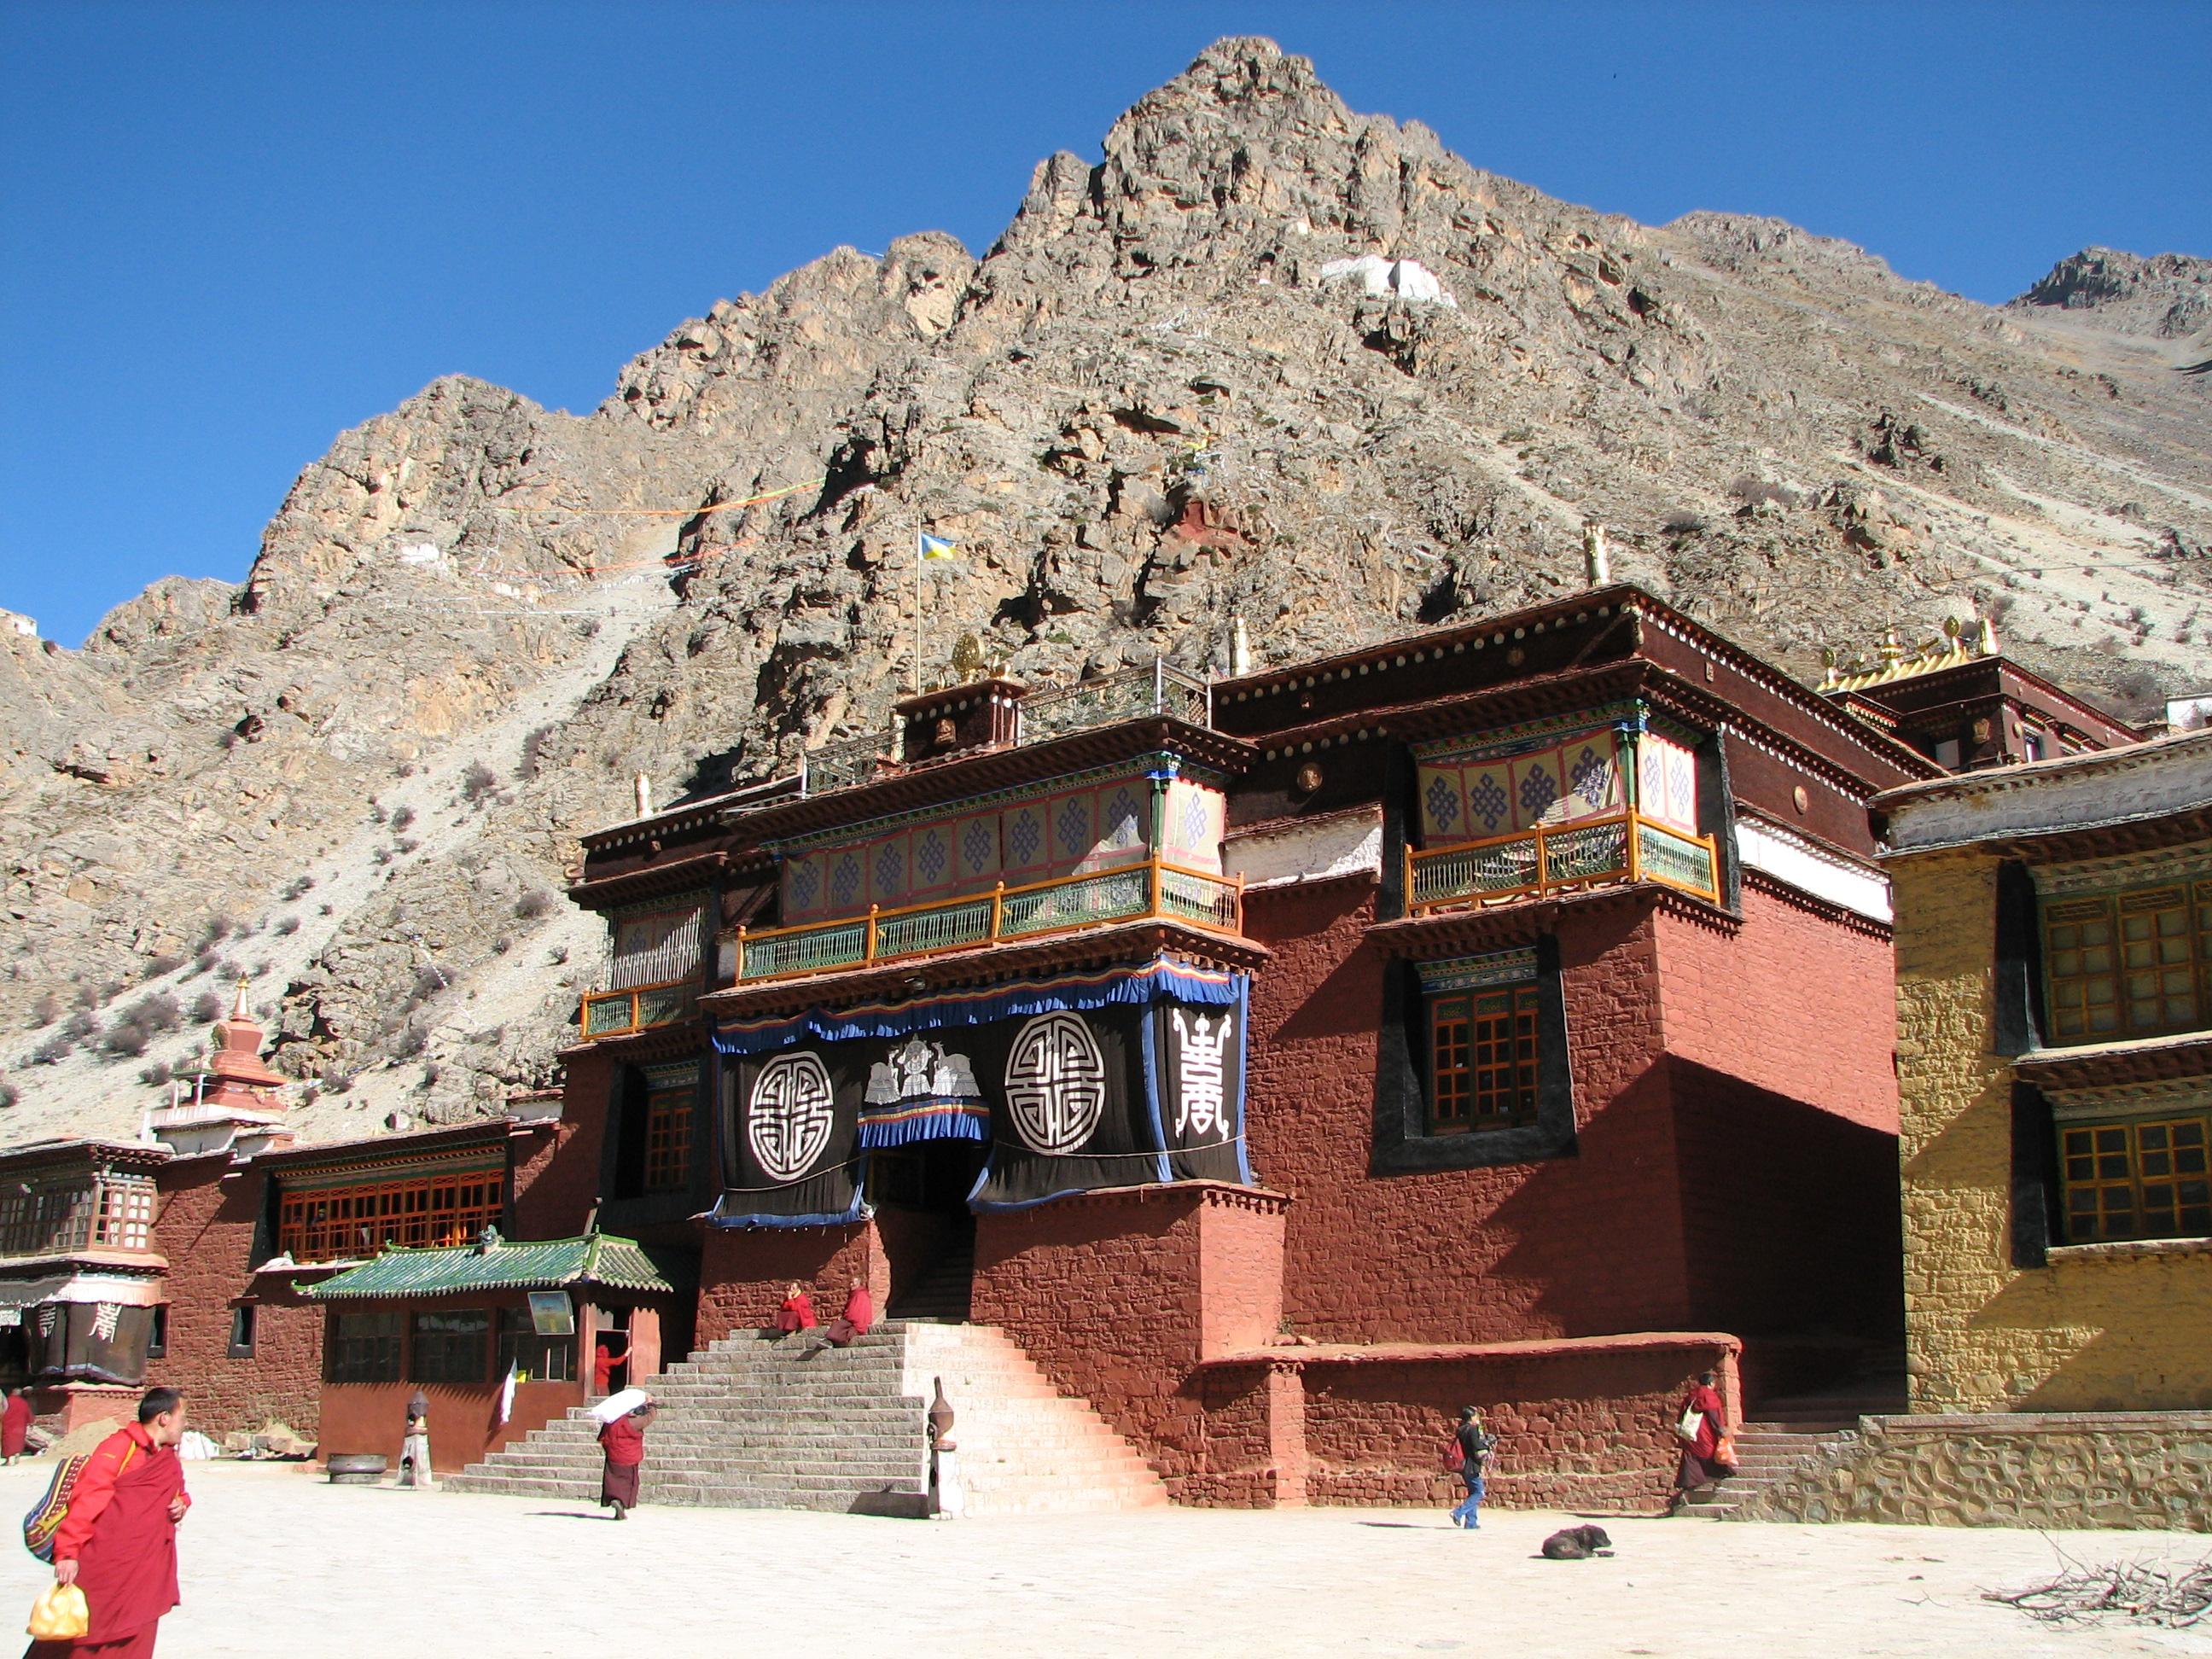 tibetan mountains - Google Search | Monk moodboard | Pinterest ...